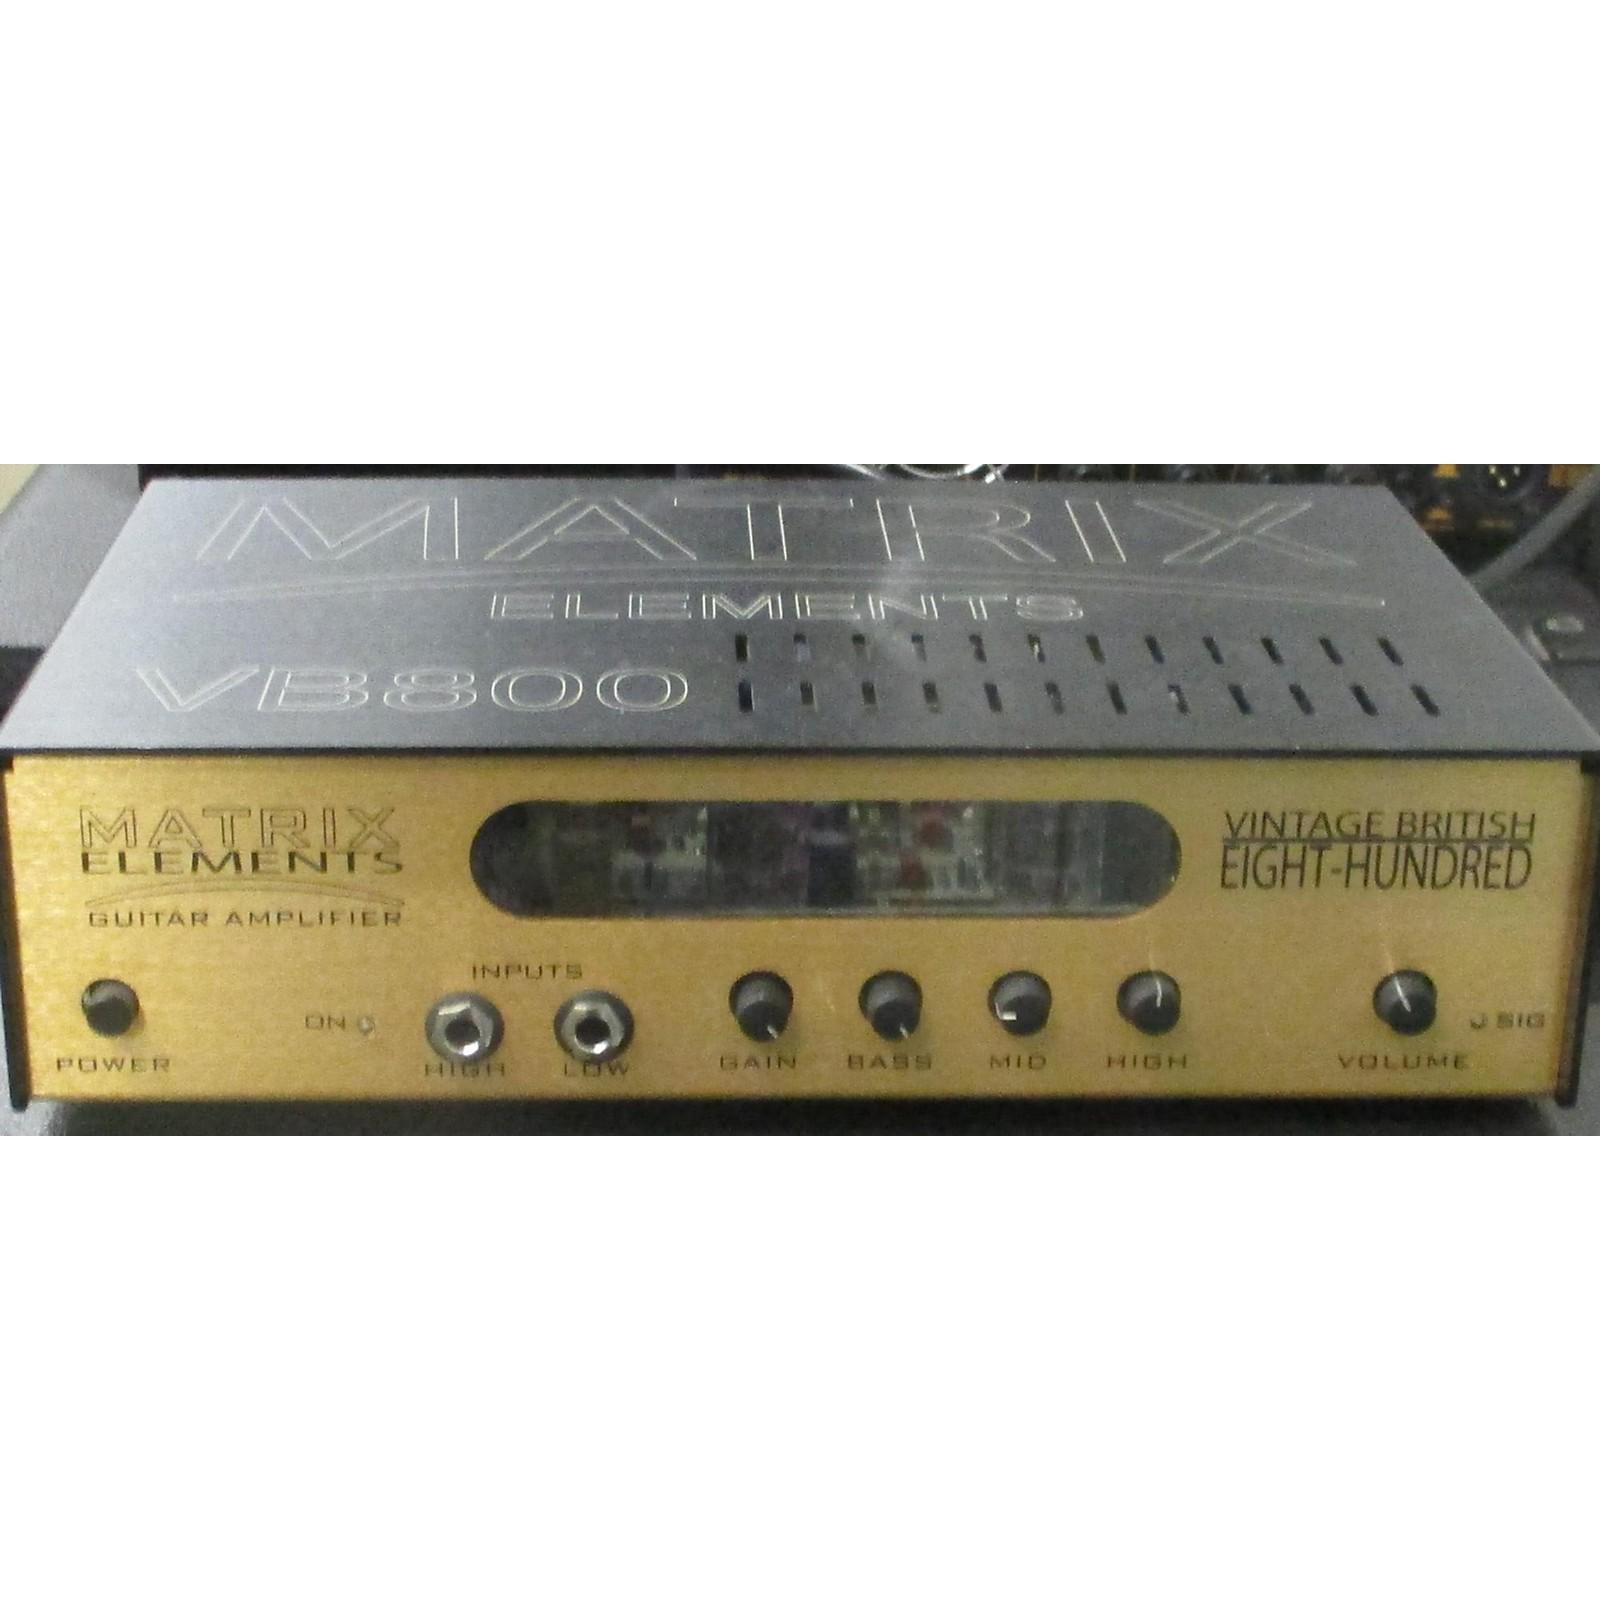 Matrix Elements VB800 Vintage British Guitar Amp Head